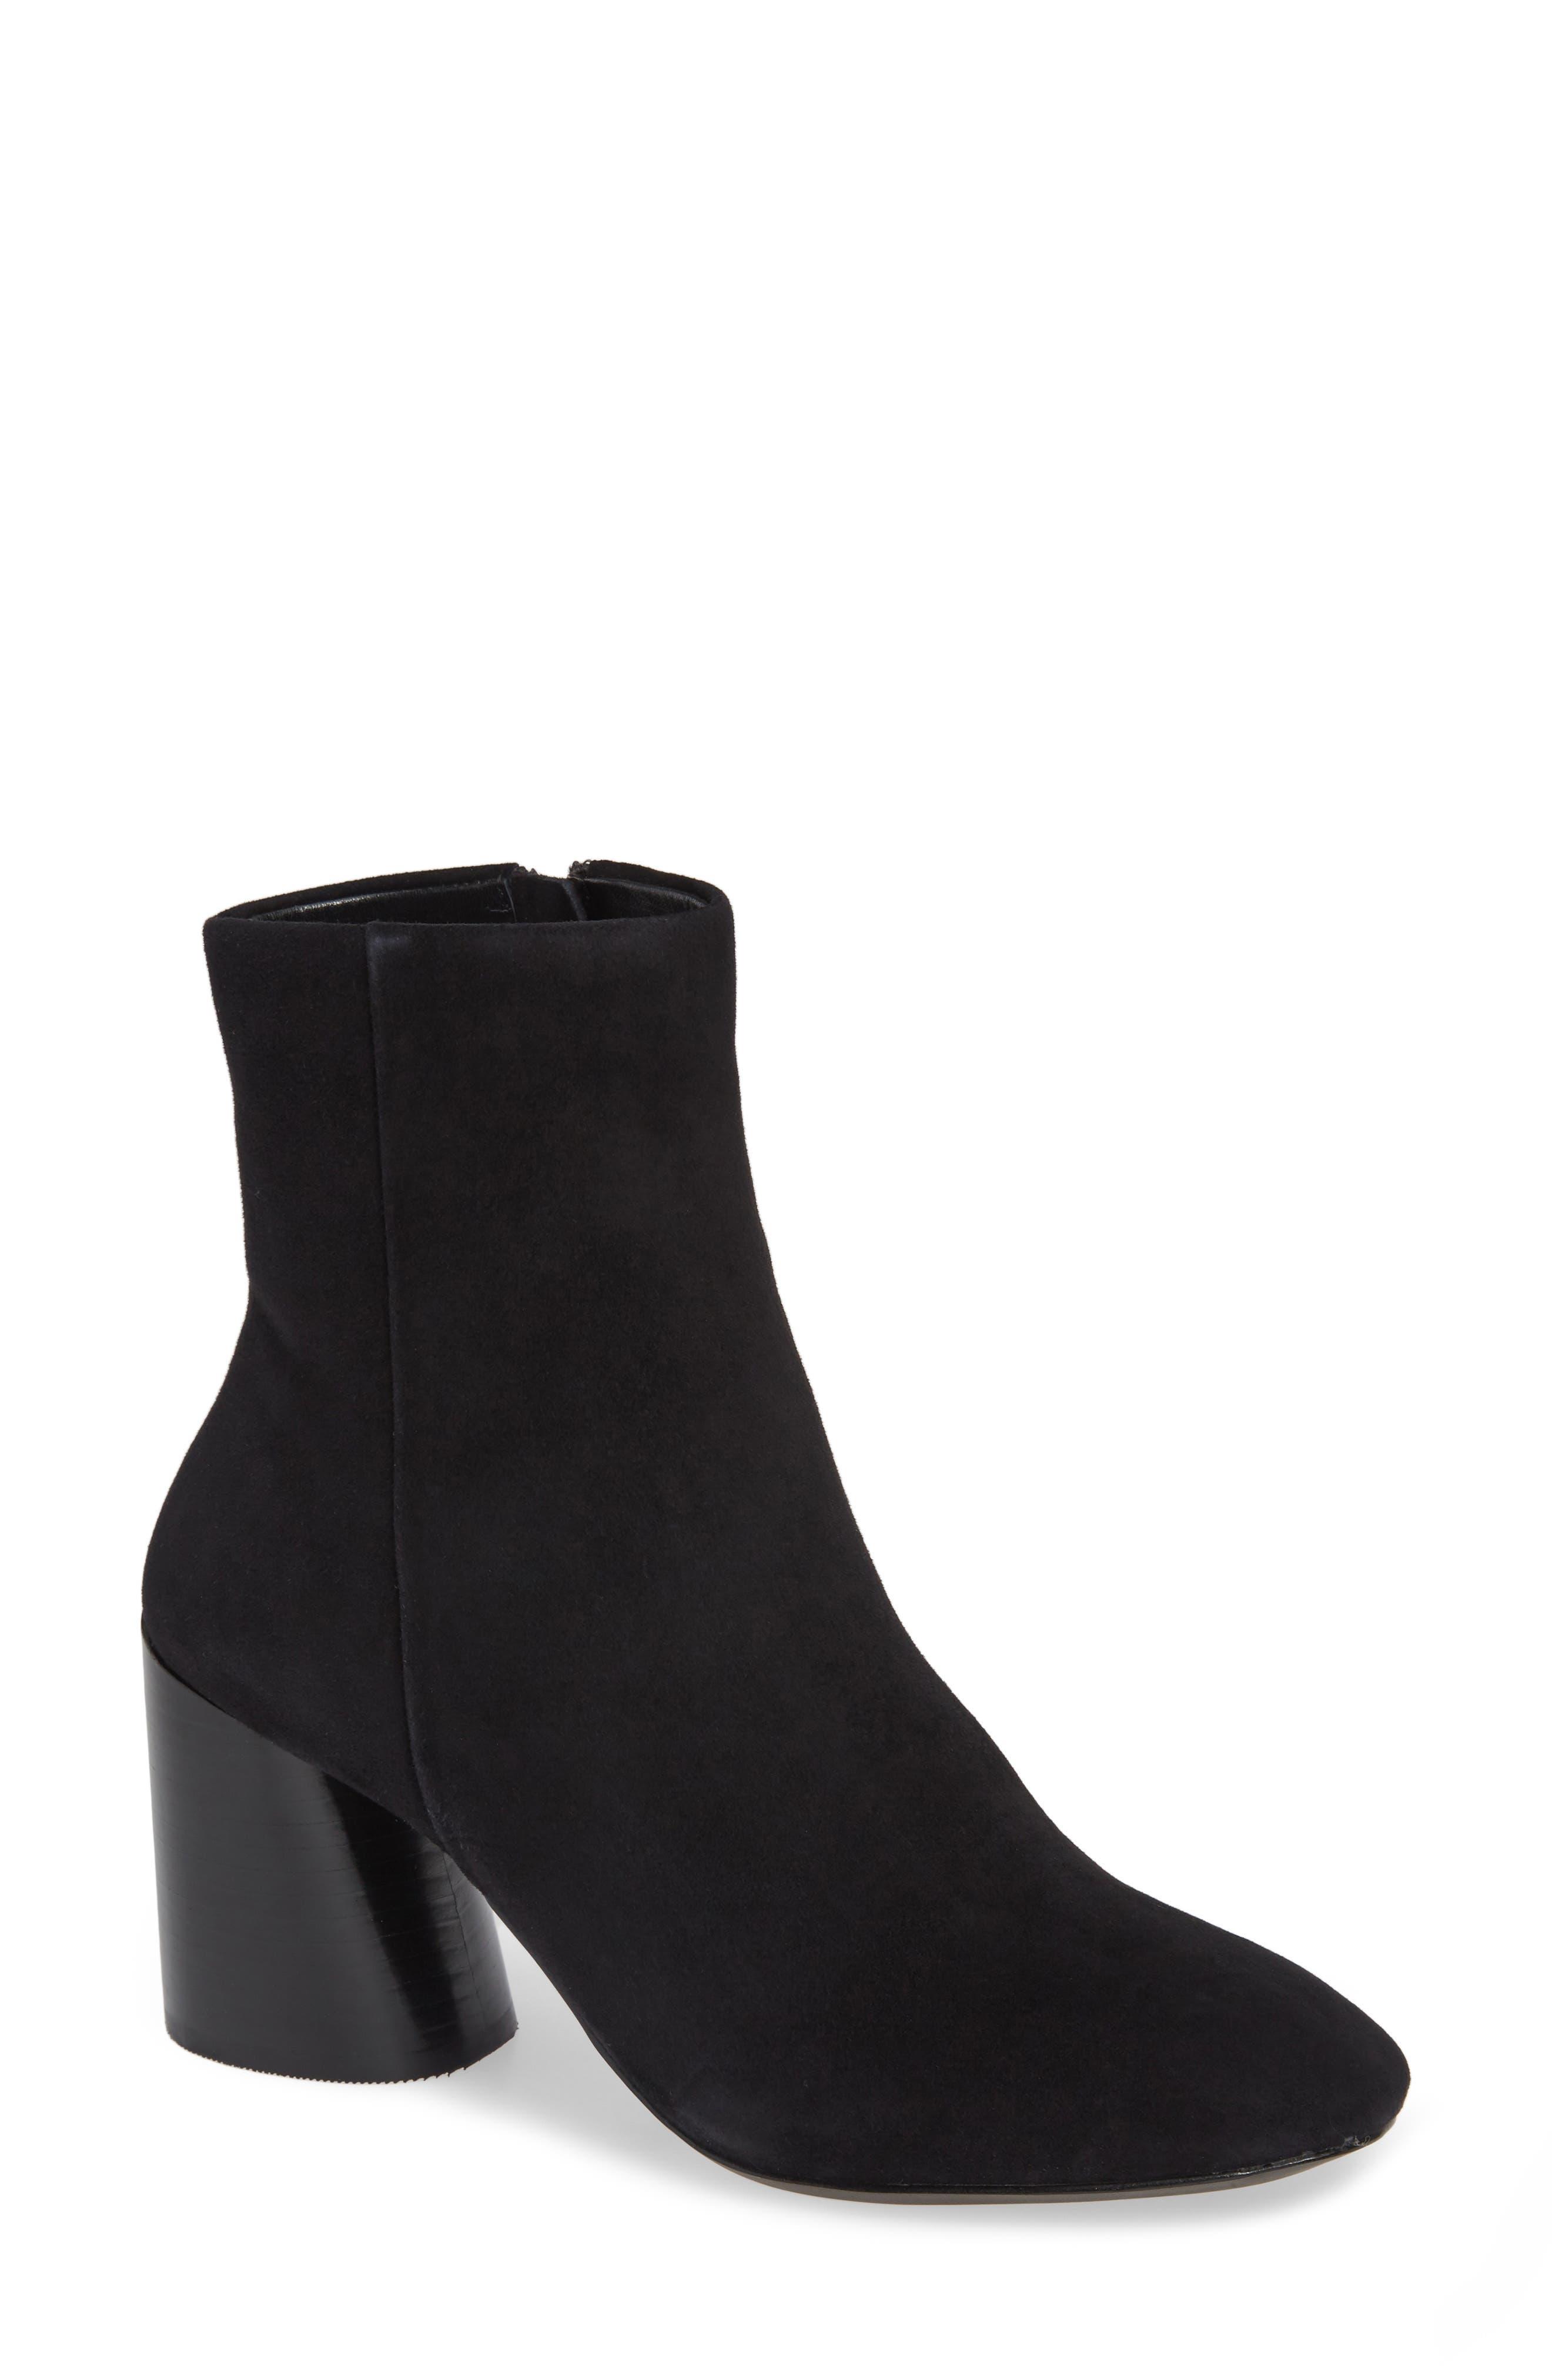 Linea Paolo Savvy Block Heel Bootie- Black